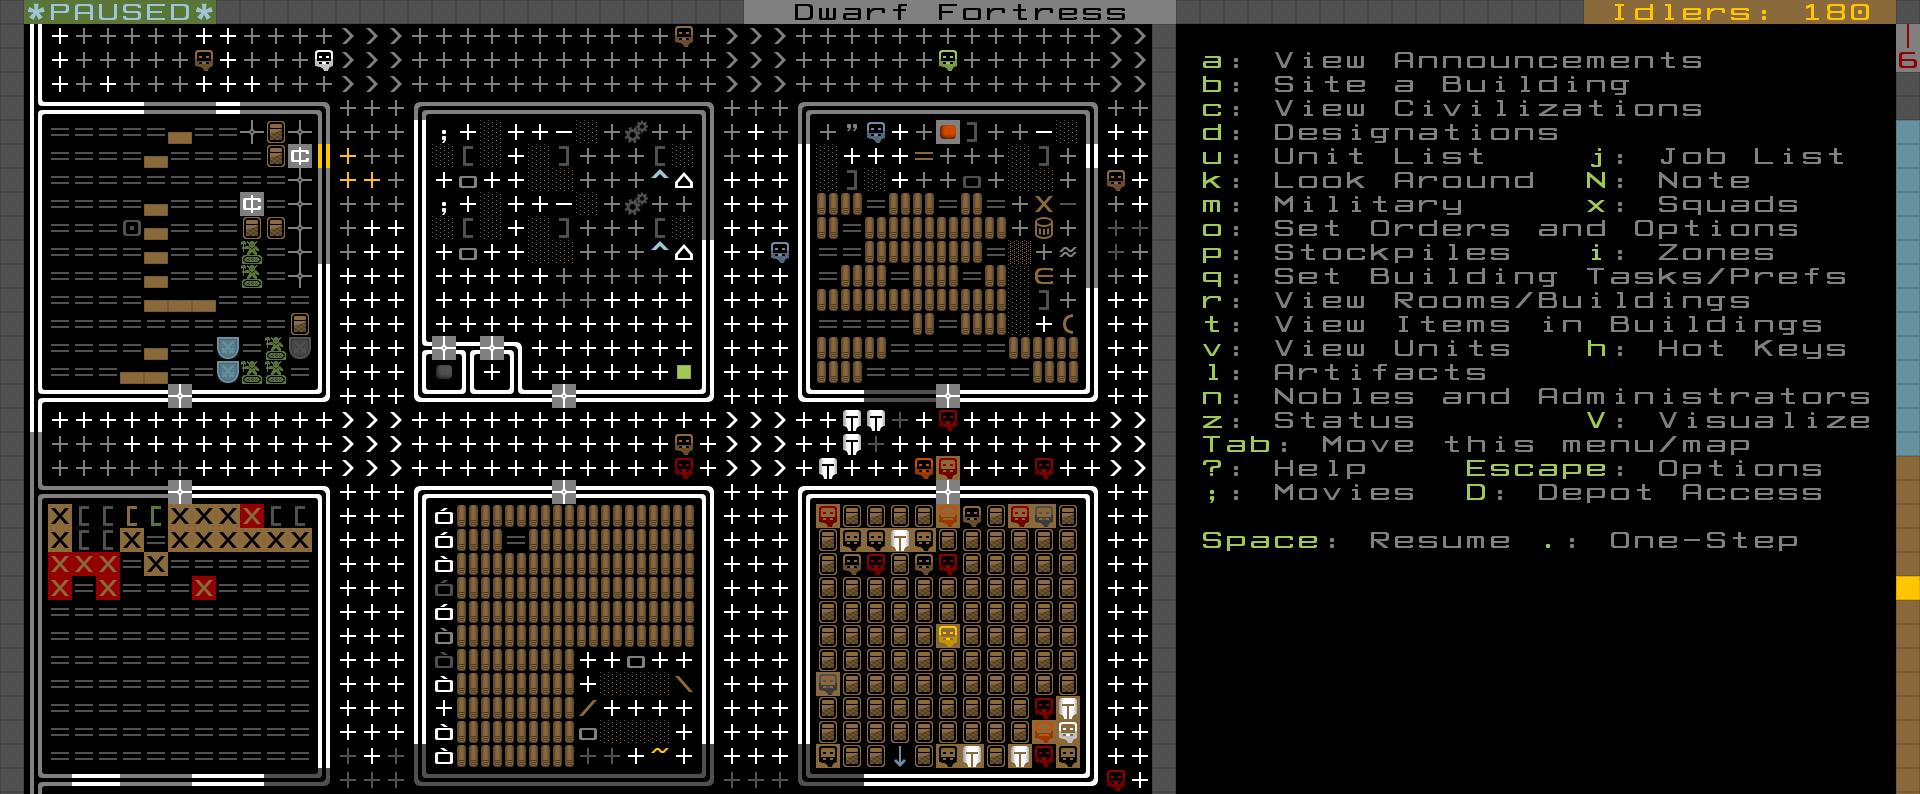 dwarf fortress tile set - digitalspace info